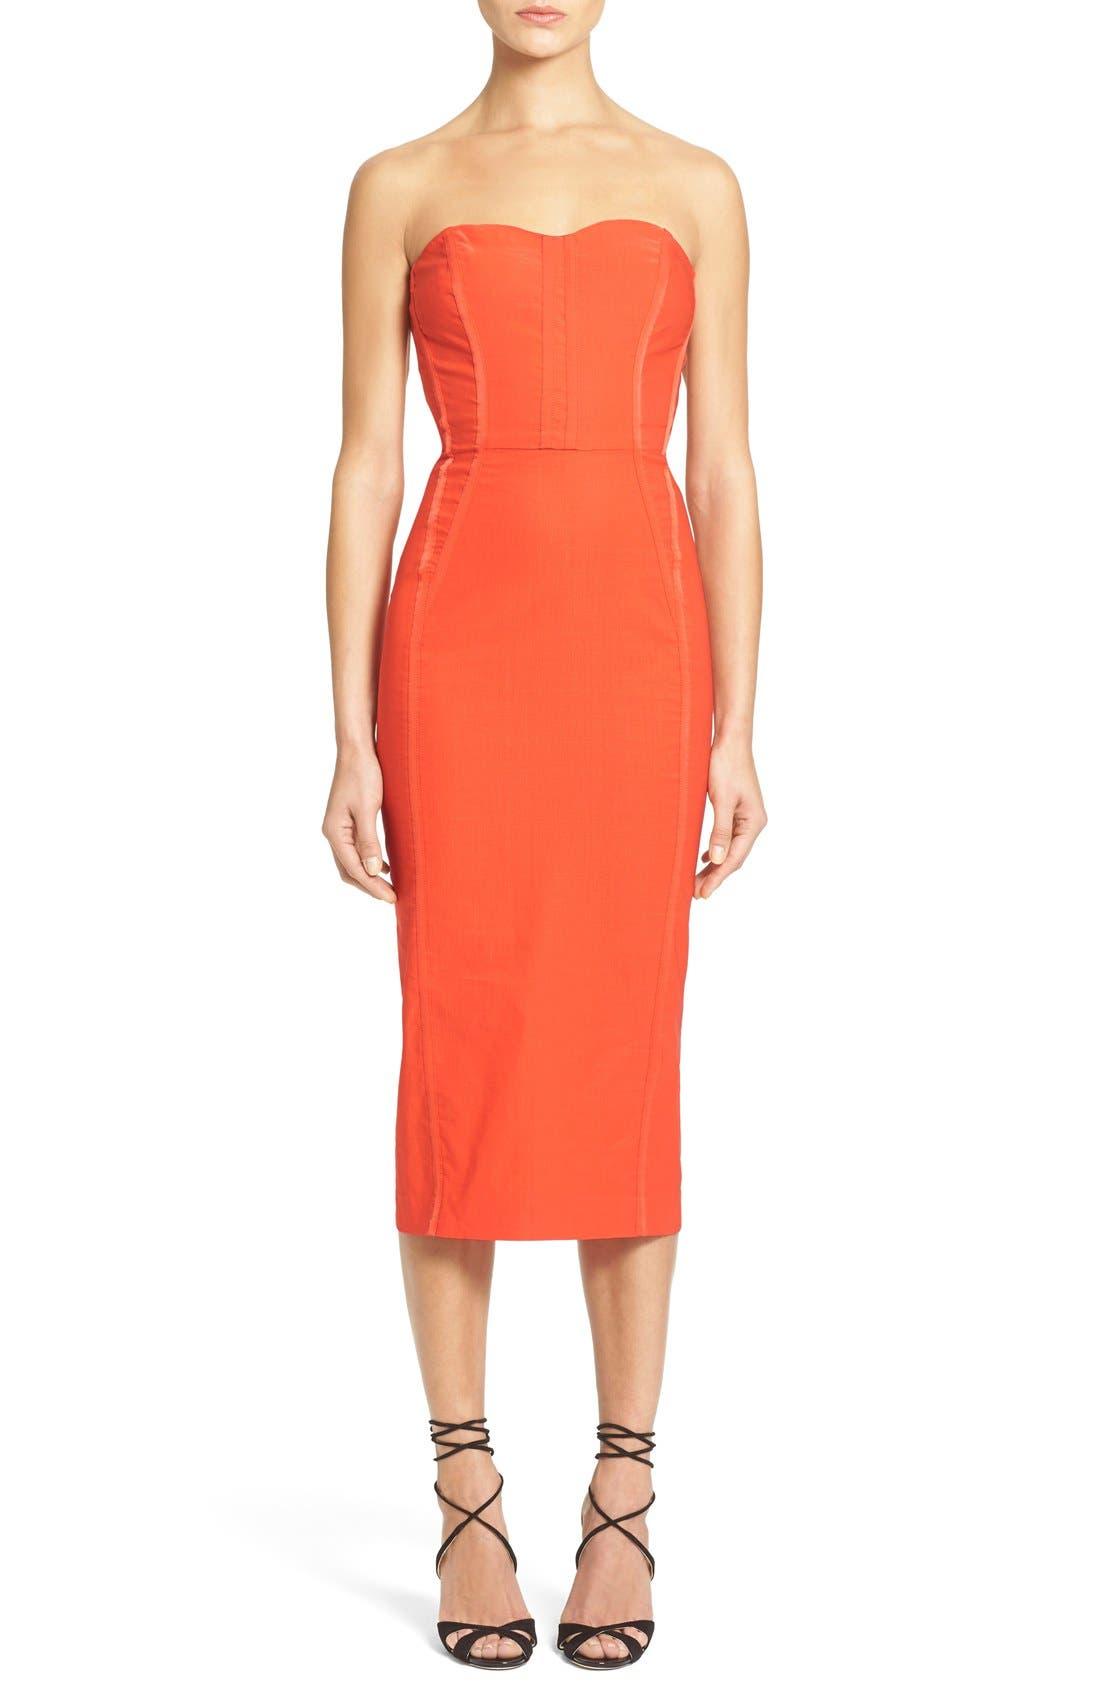 'Maui' Strapless Bustier Dress, Main, color, 606